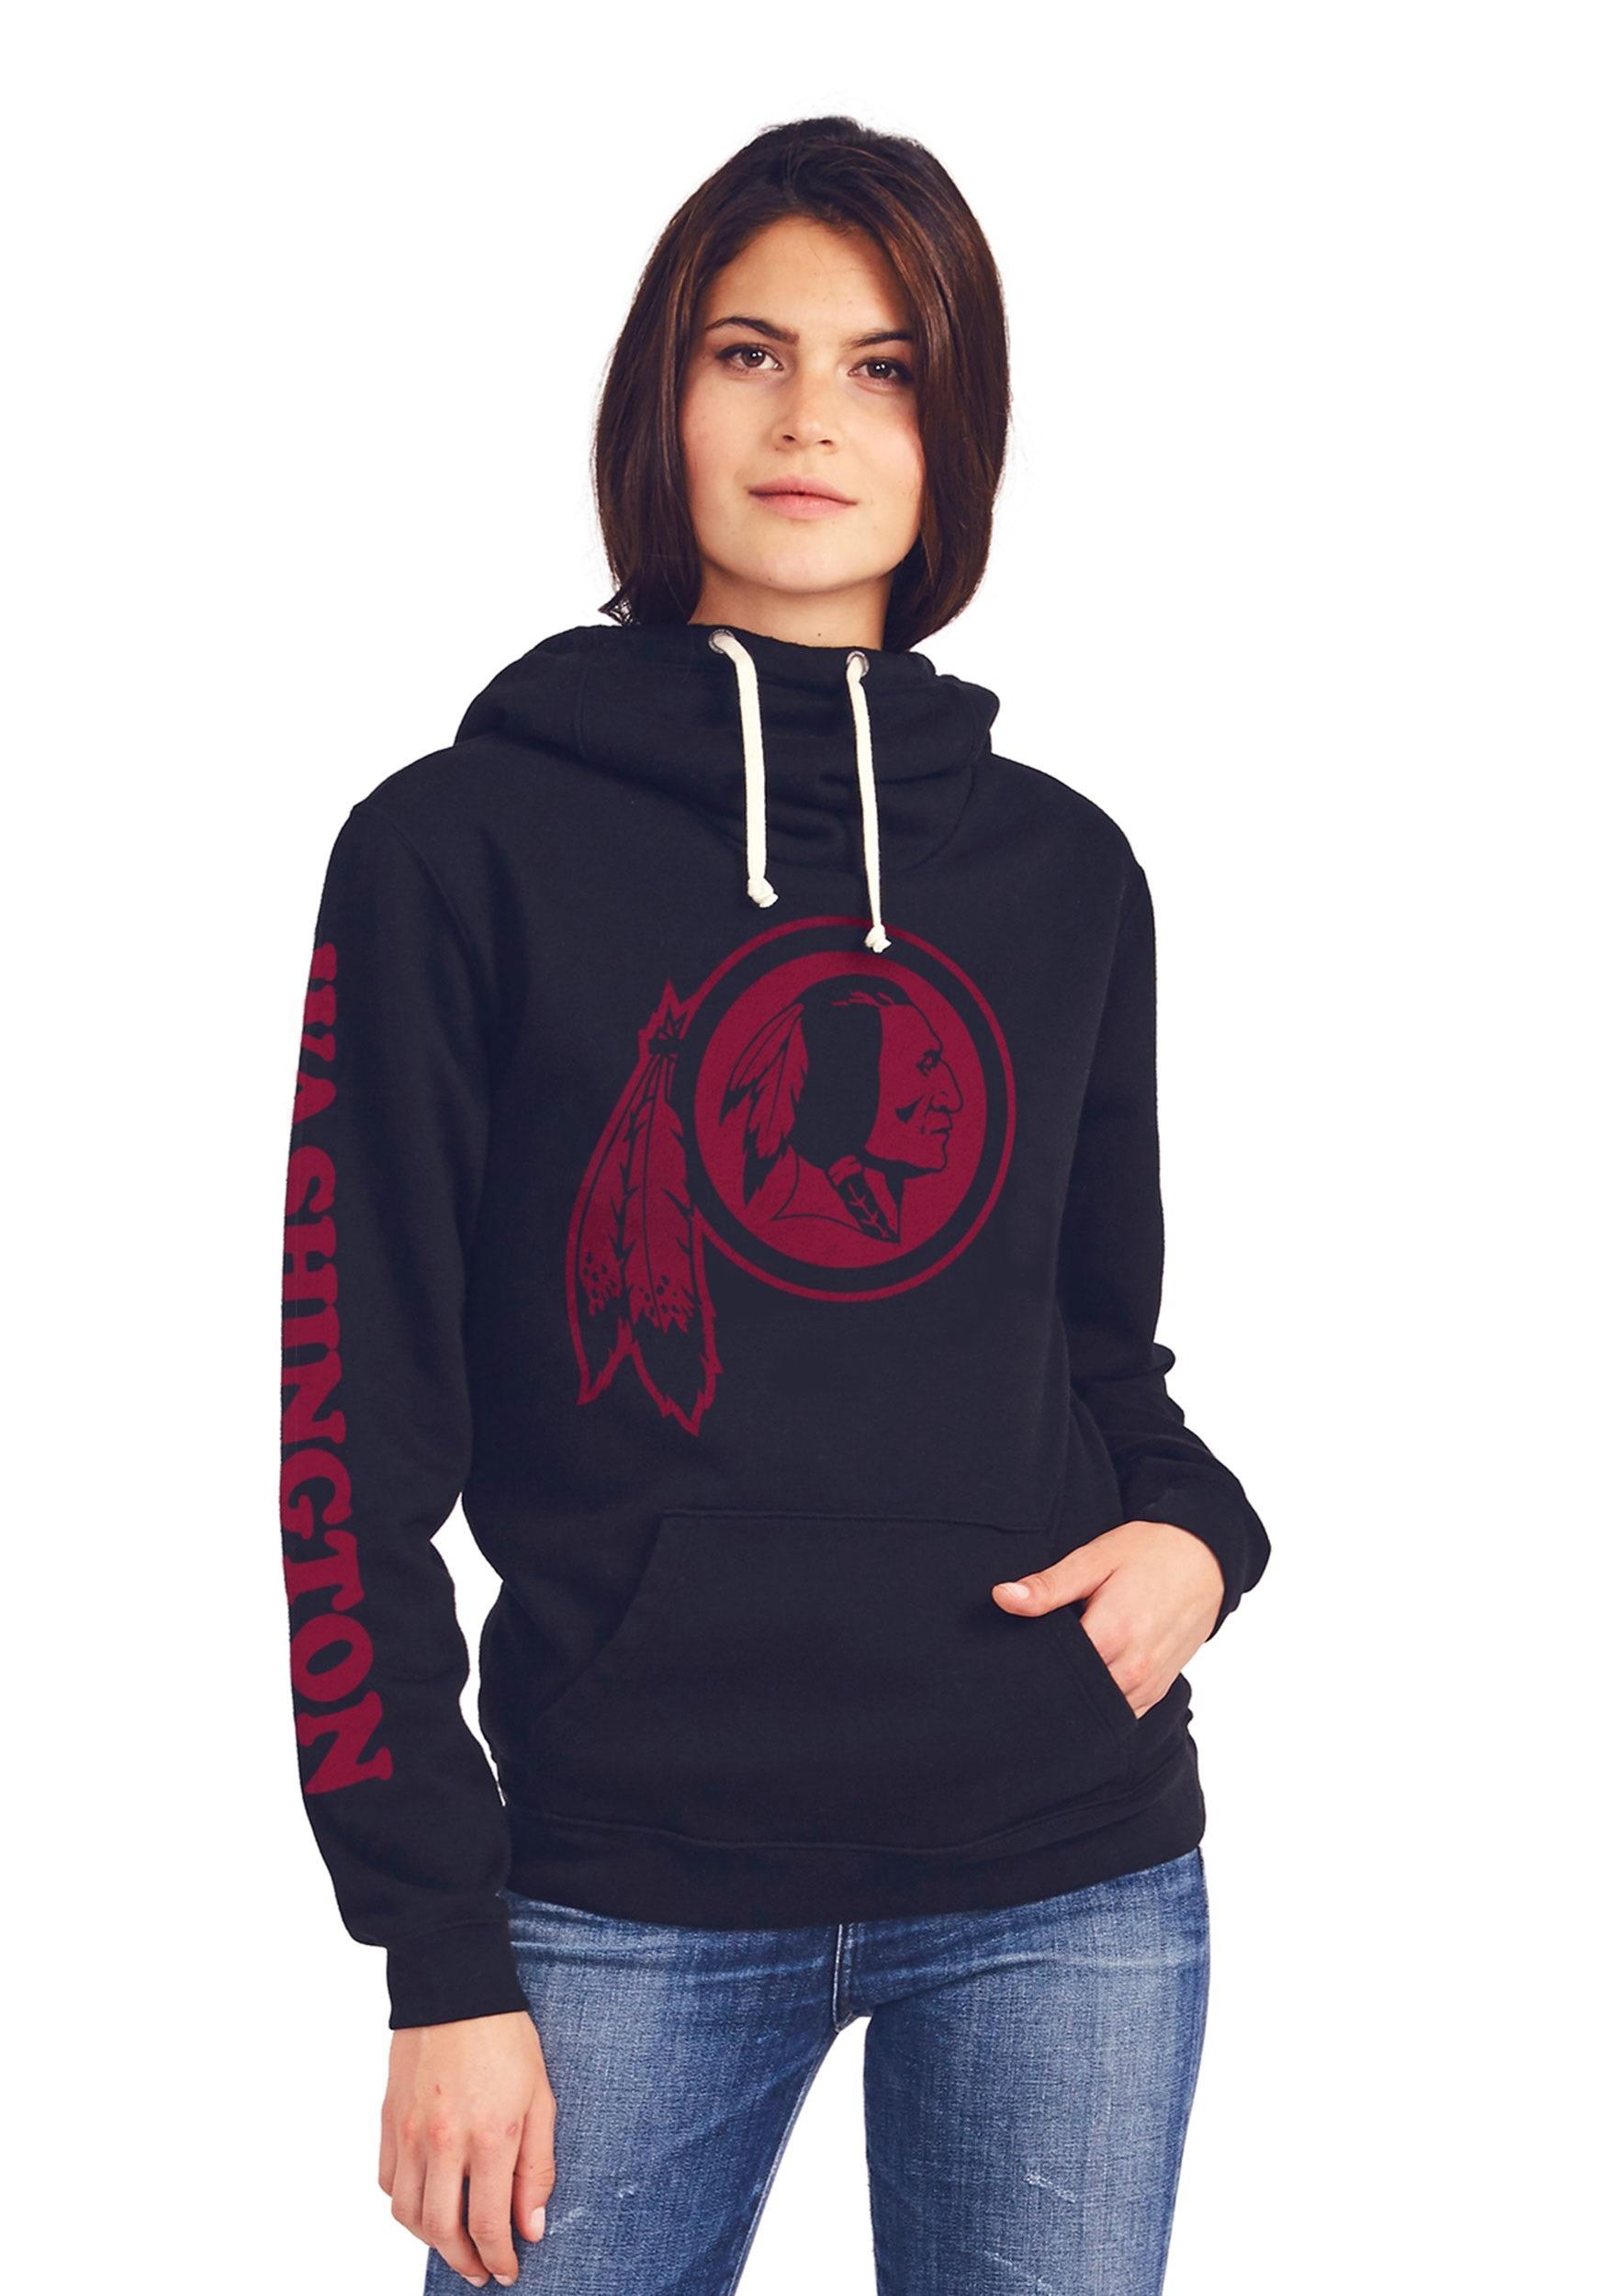 Washington Redskins Women's Cowl Neck Hooded Sweatshirt